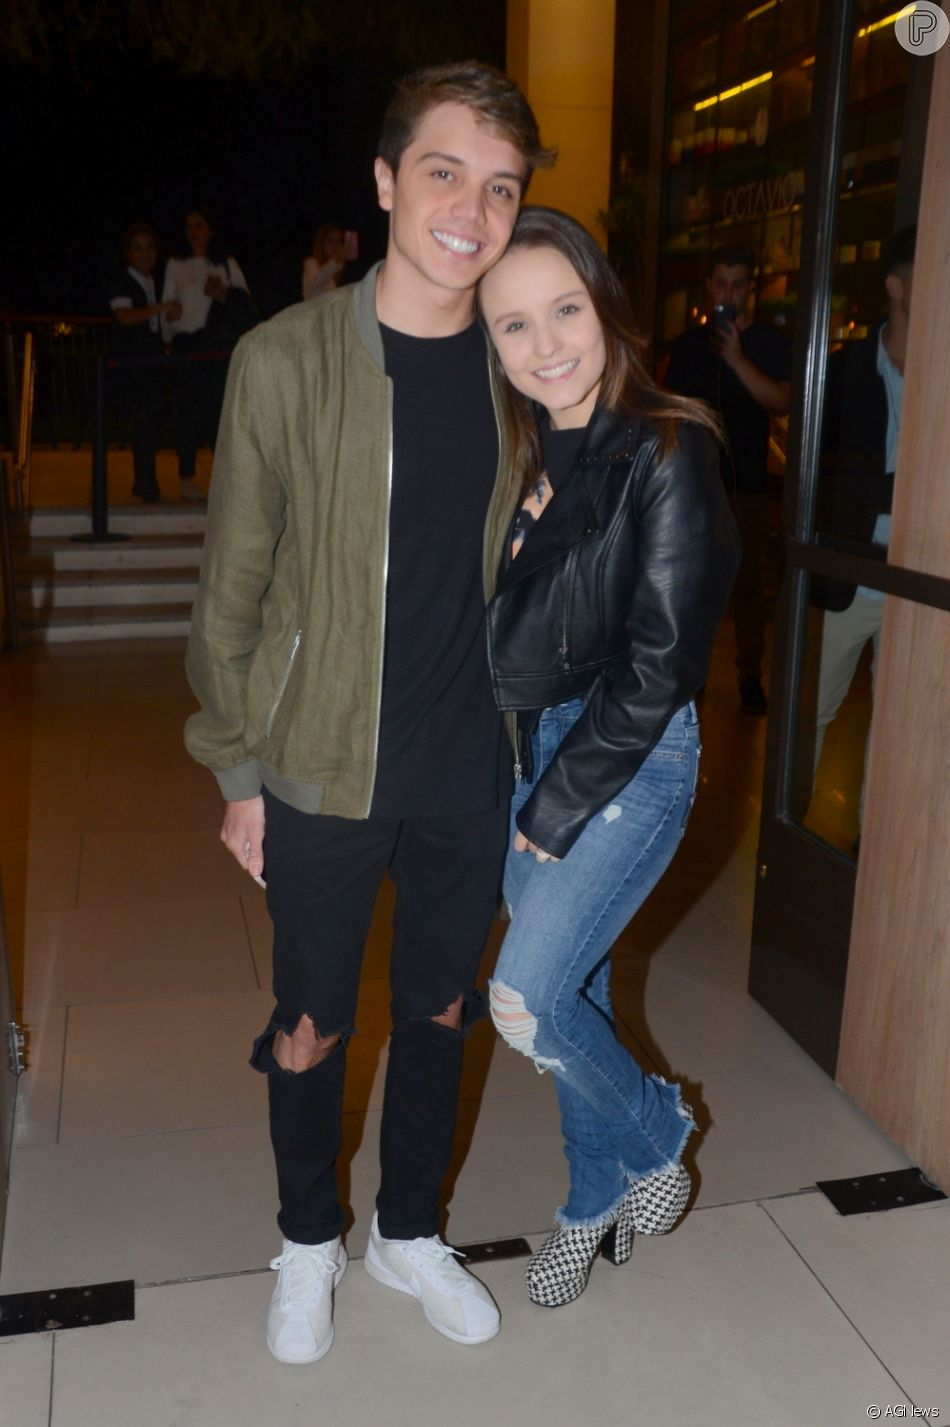 b00c769eb1c99 Larissa Manoela e o namorado